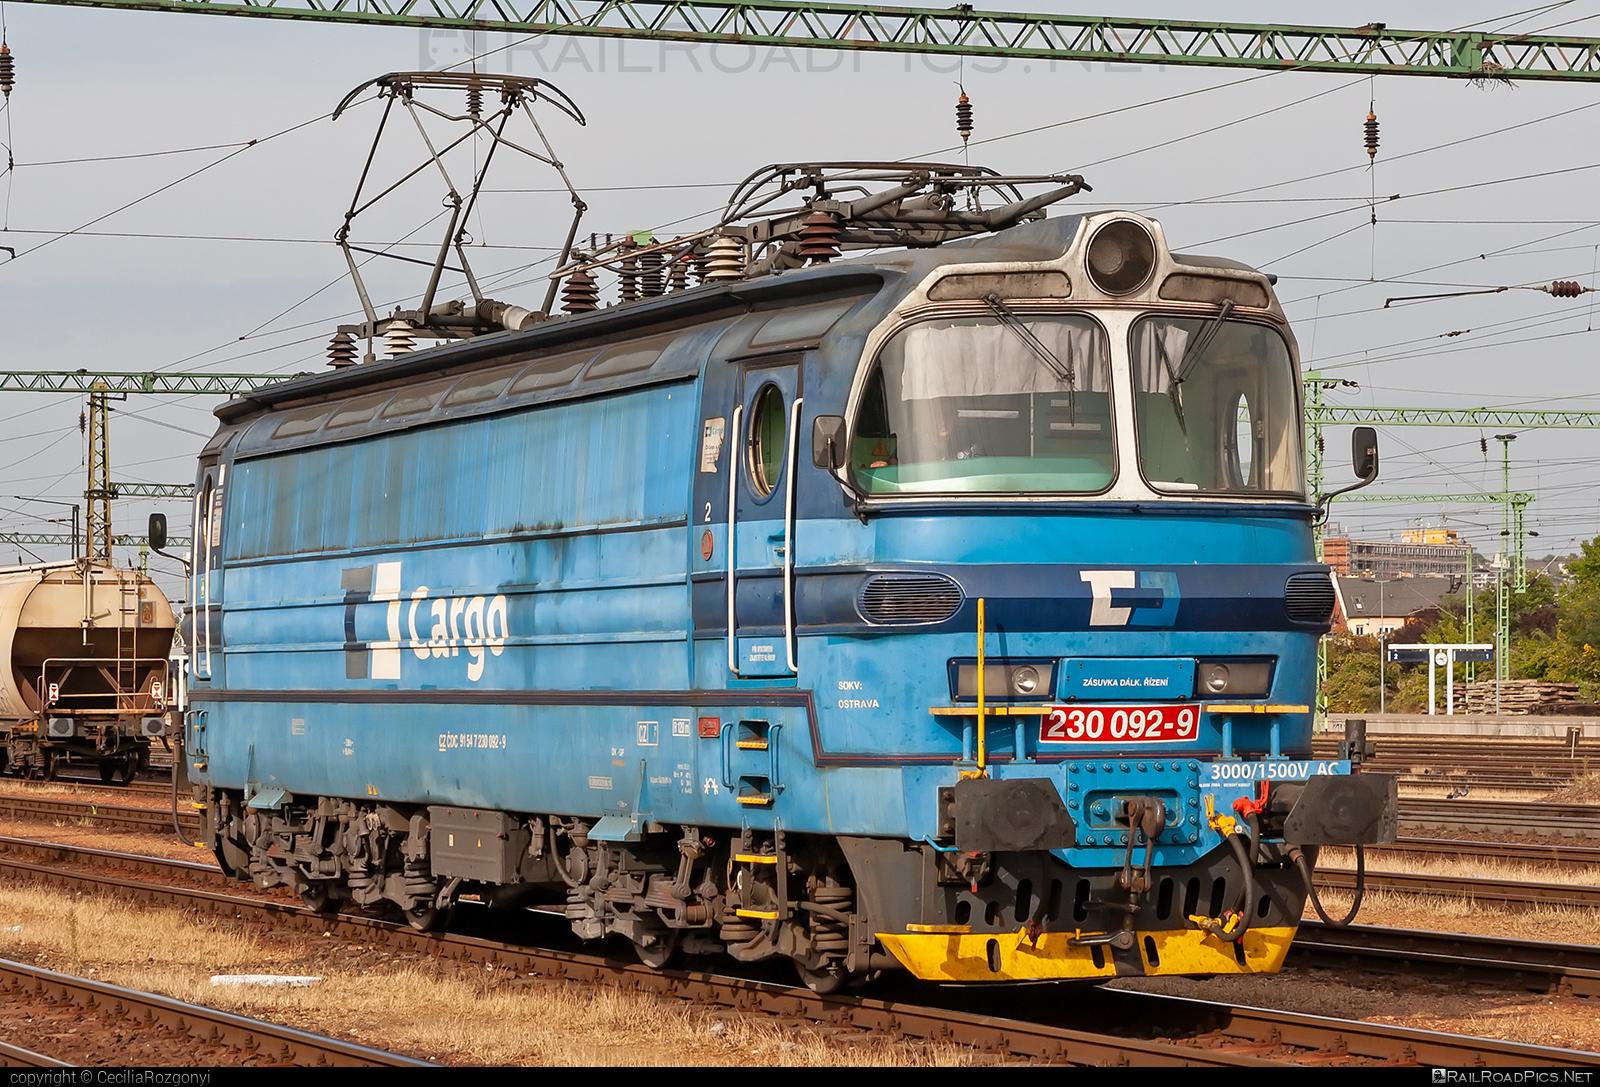 Škoda 47E - 230 092-9 operated by ČD Cargo, a.s. #cdcargo #laminatka #locomotive240 #skoda #skoda47e